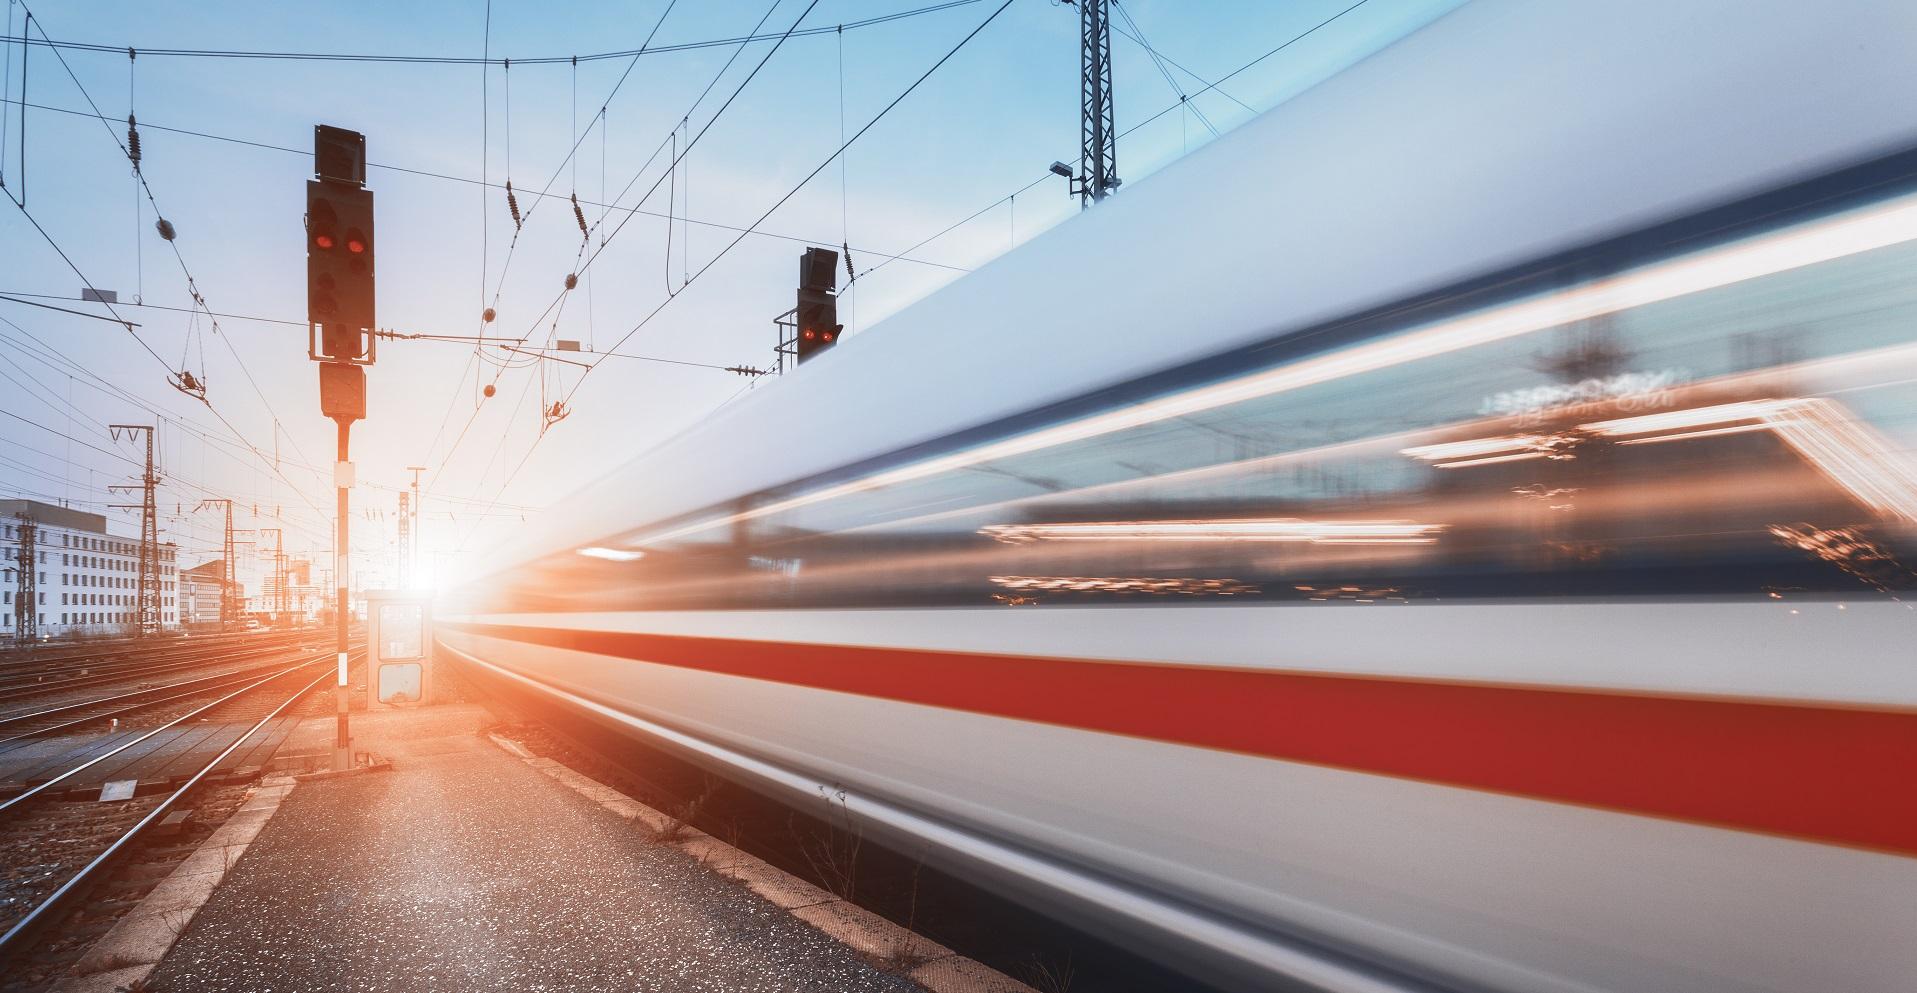 ferrocarrils_nueva